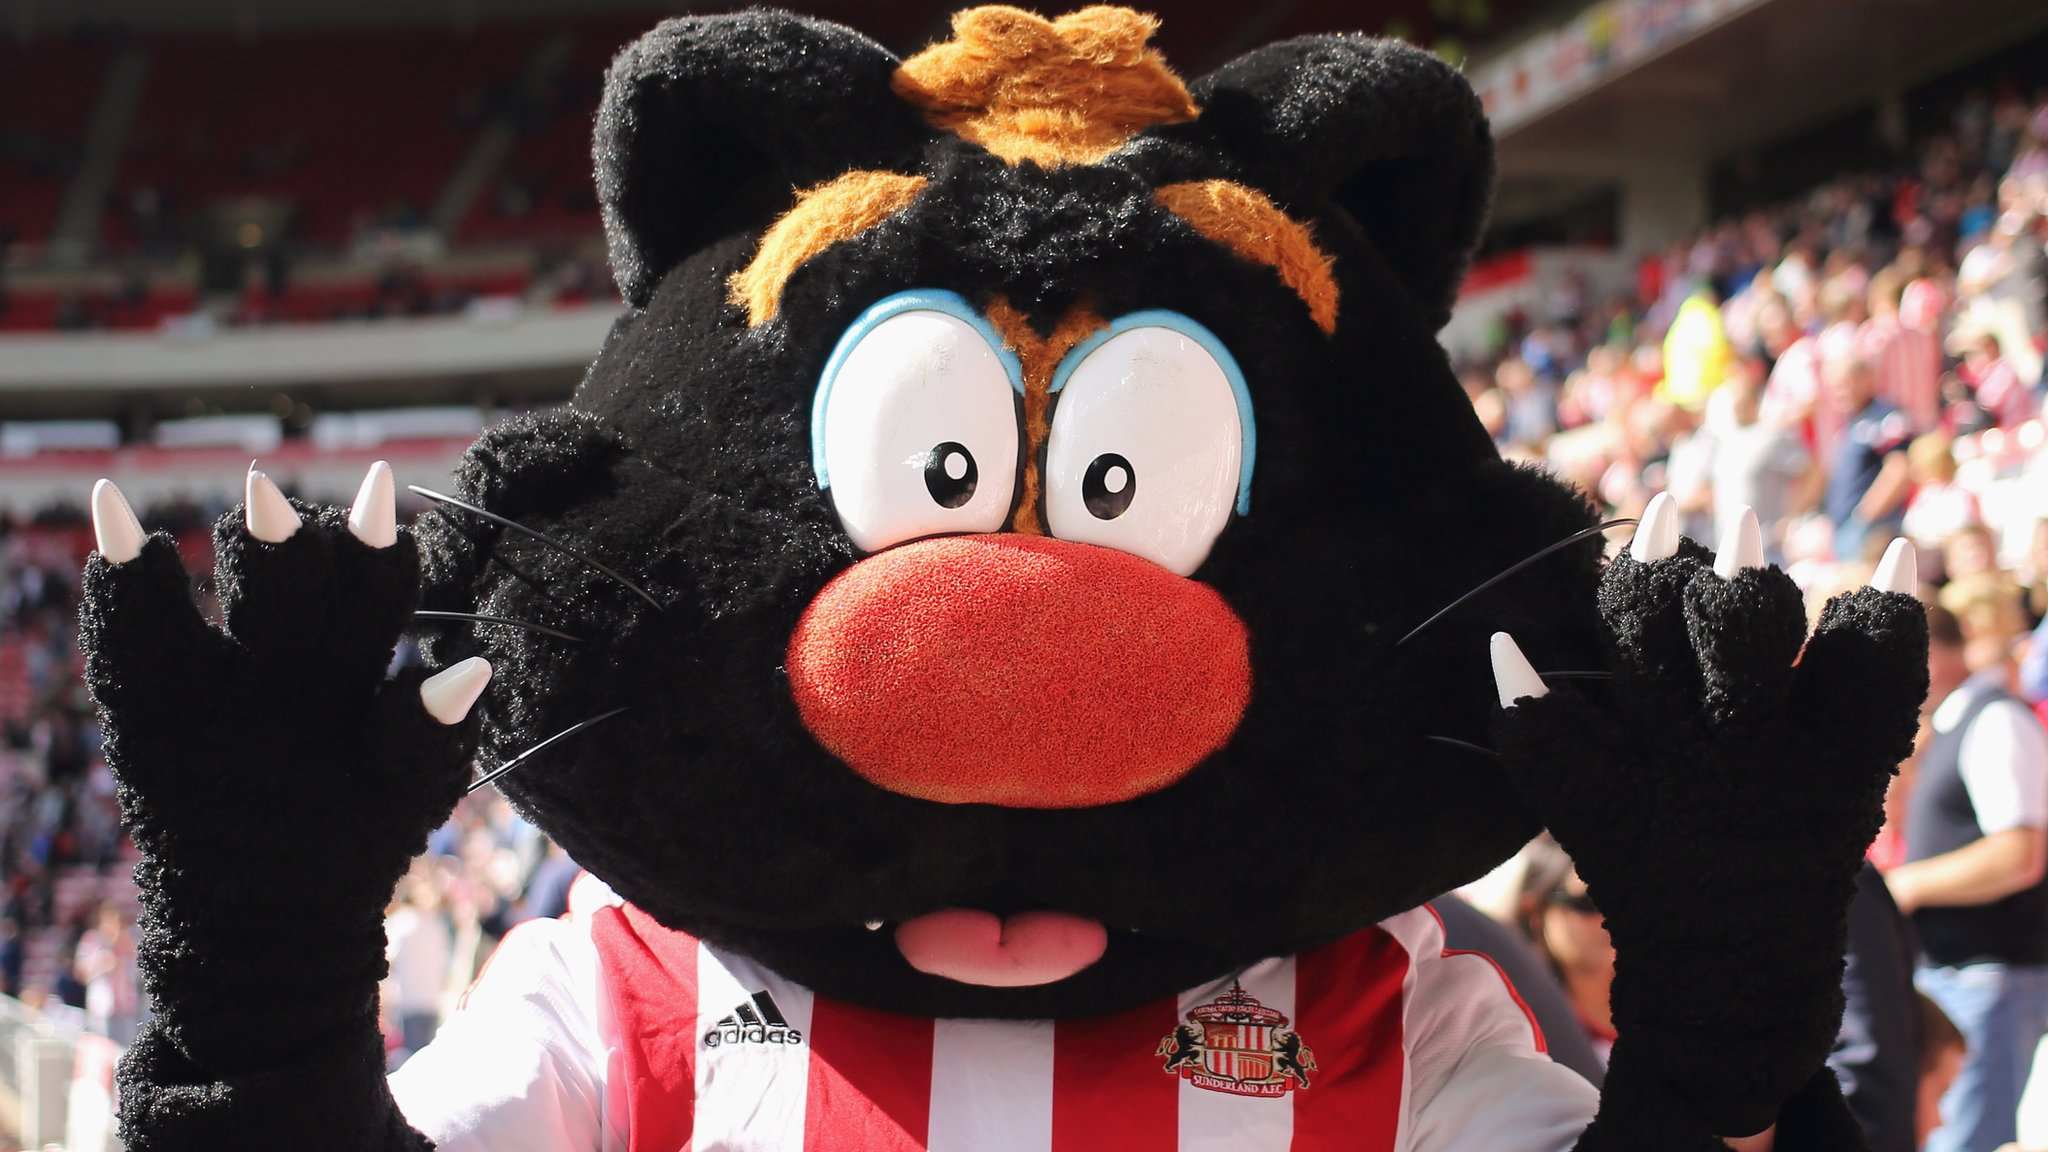 Sunderland: Tony Davison named club's managing director after stint as mascot